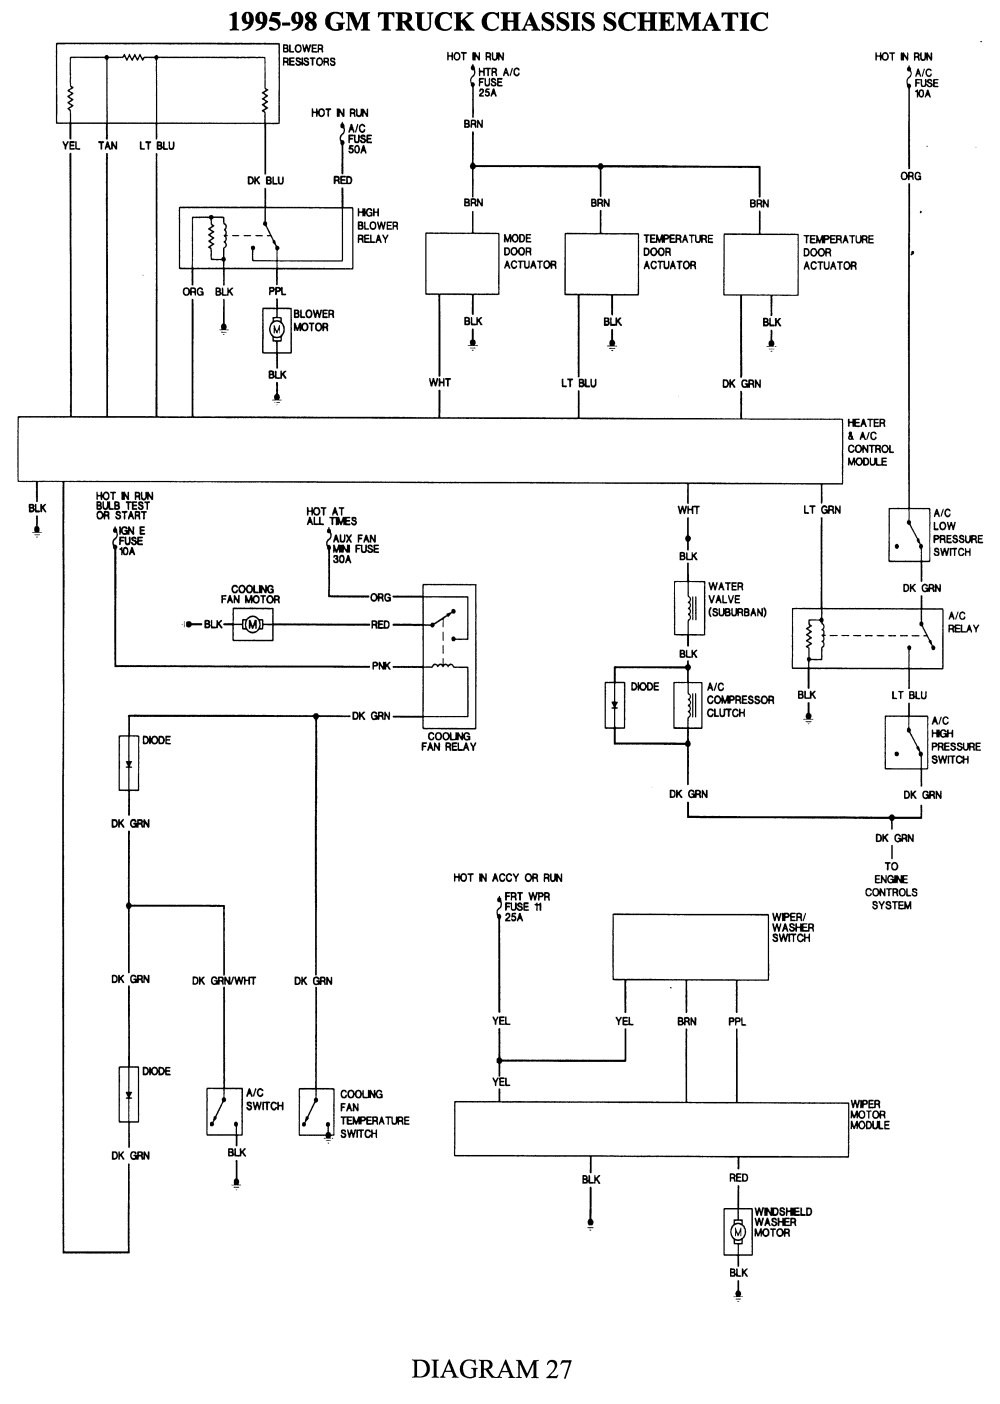 Wiring Diagram Abbreviations Marvellous Repair Guides Wiring Diagrams Wiring Diagrams 38 Elegant Wiring Diagram Abbreviations